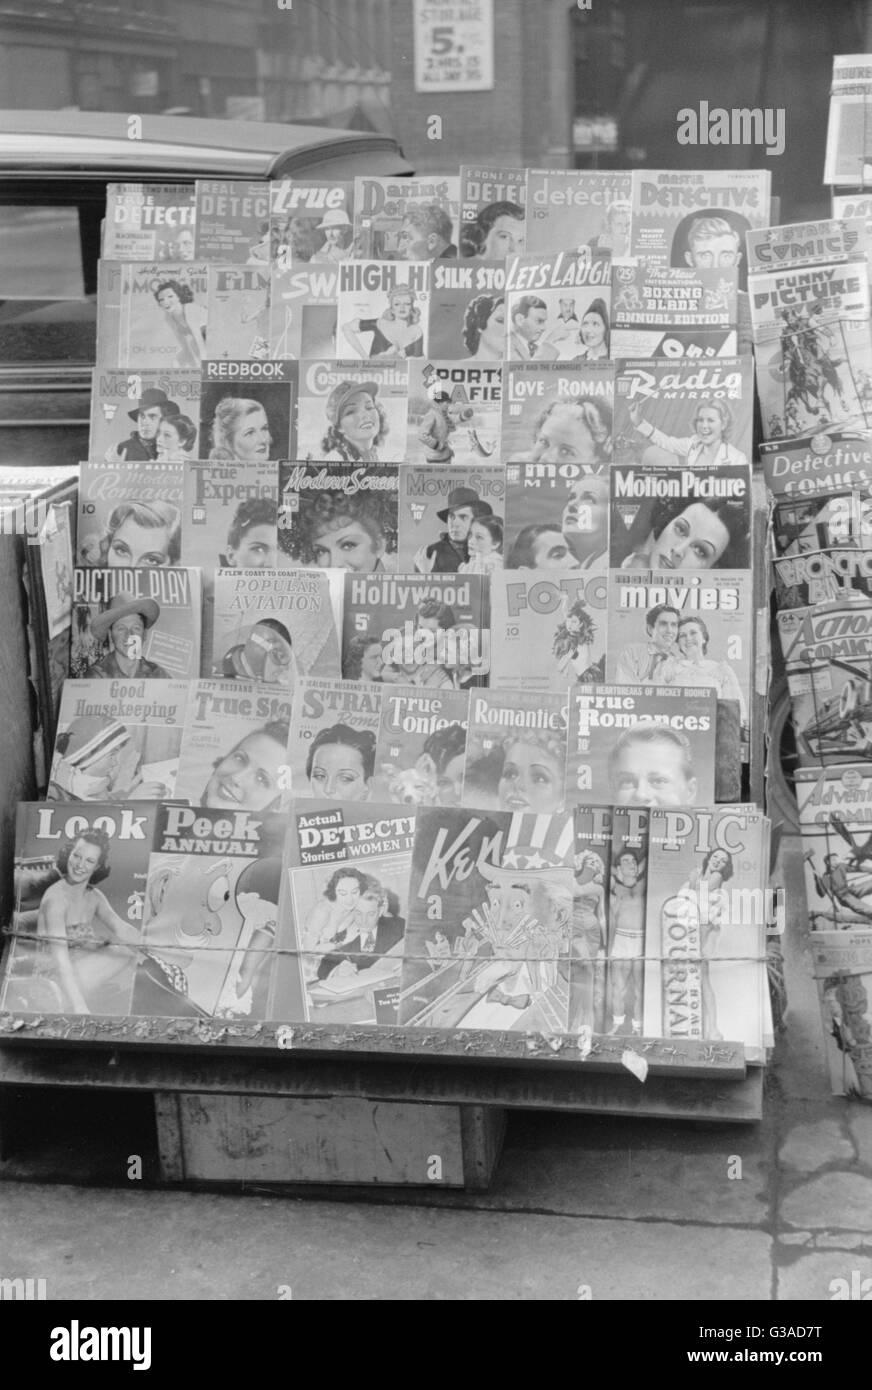 Magazines at newsstand, Saint Louis, Missouri. Date 1939 Jan. - Stock Image